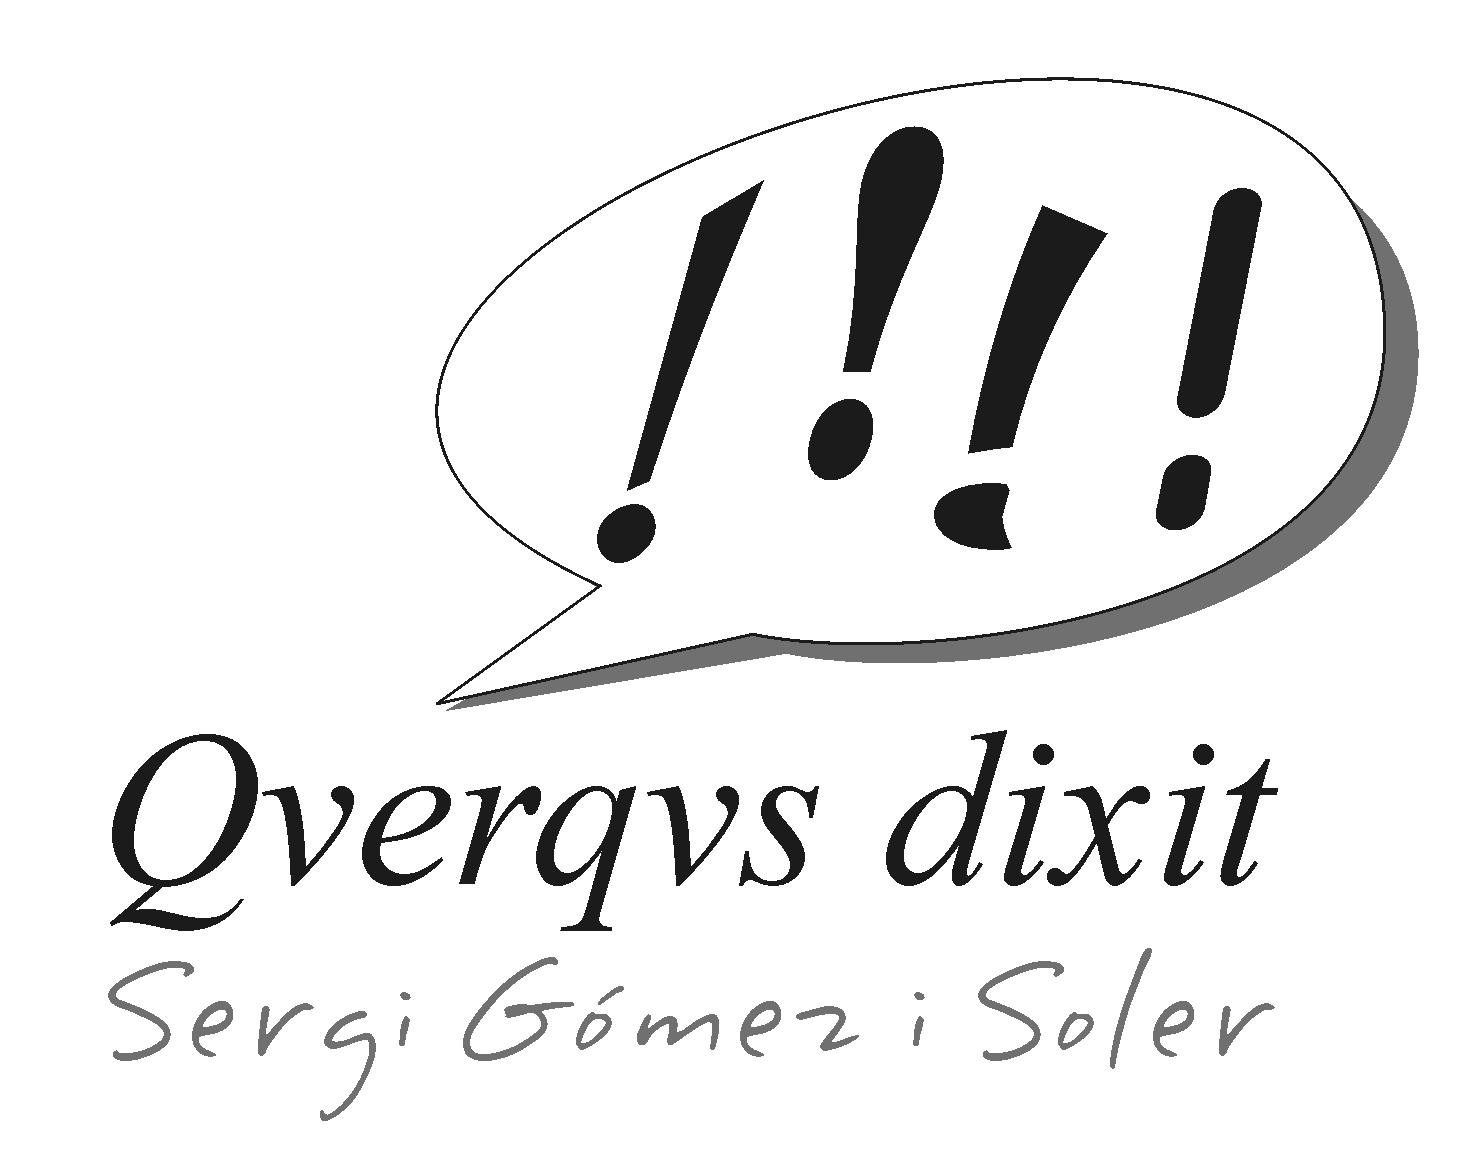 QVERQVS DIXIT